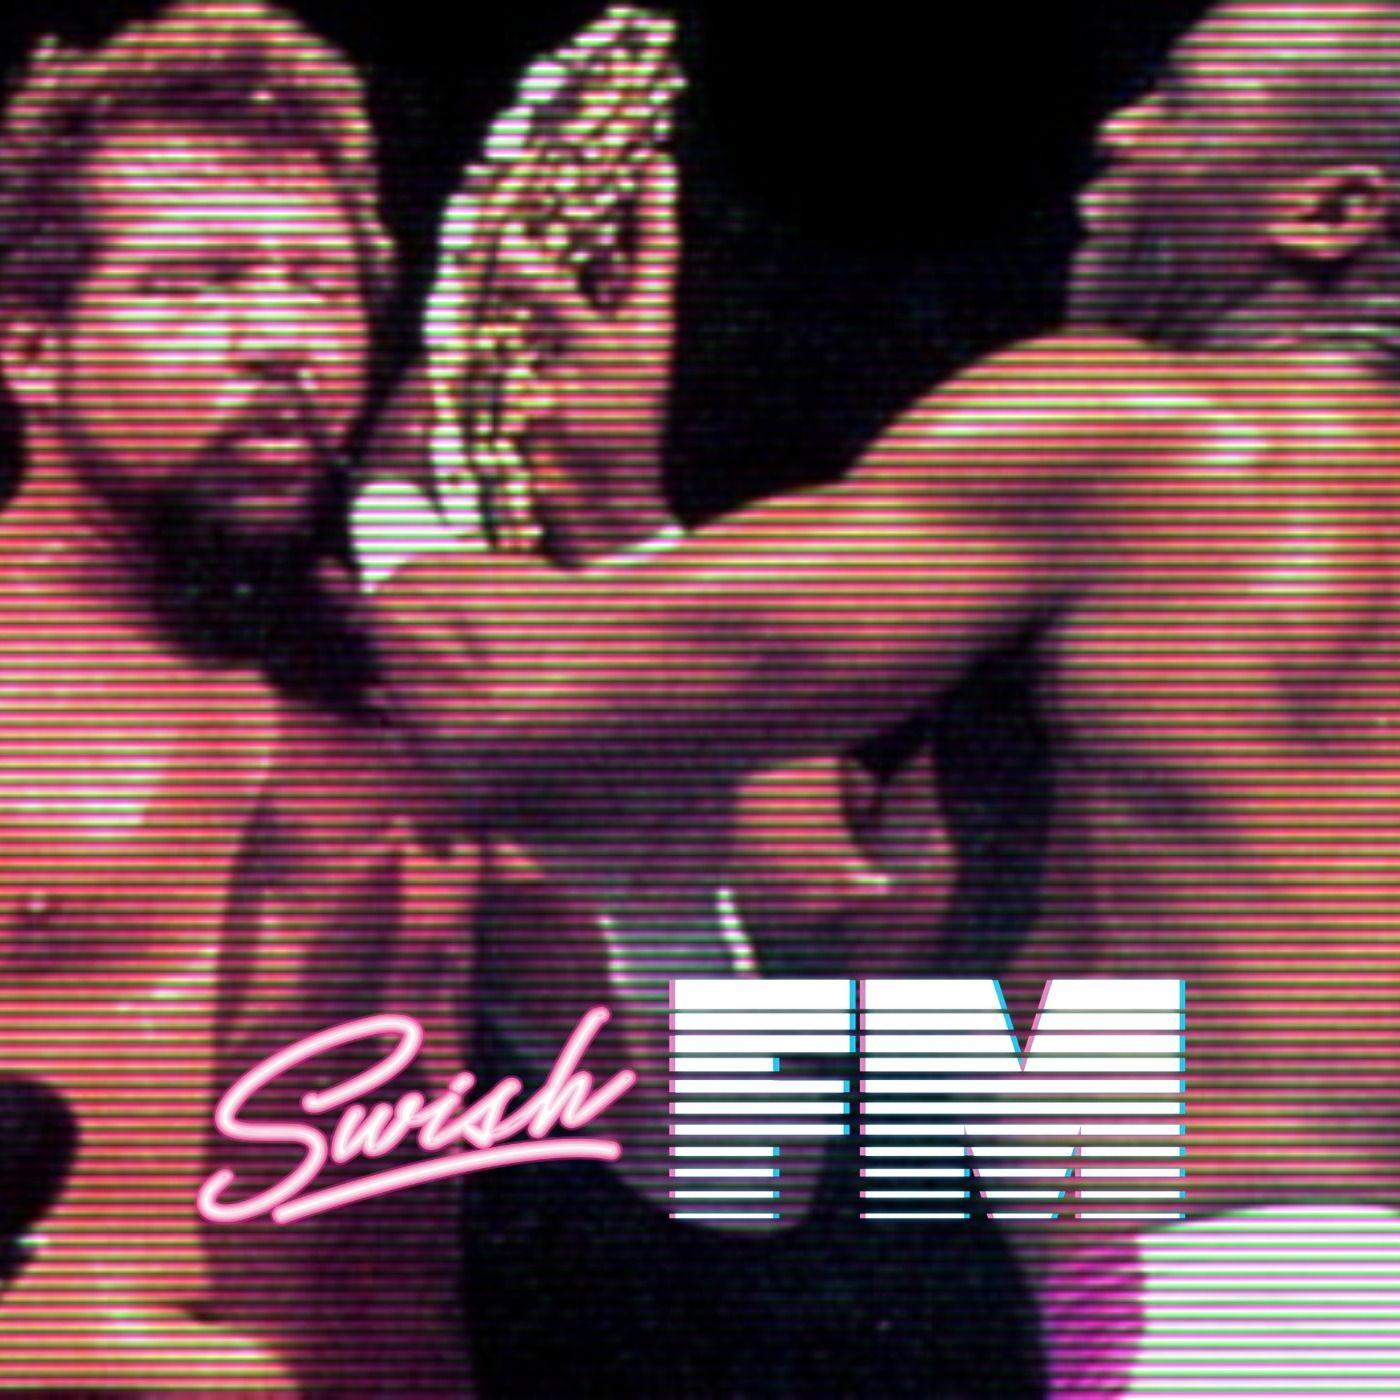 Deep-Dive | 1991 Royal Rumble, Chapter 7 (w/ @TrashbagGhost)